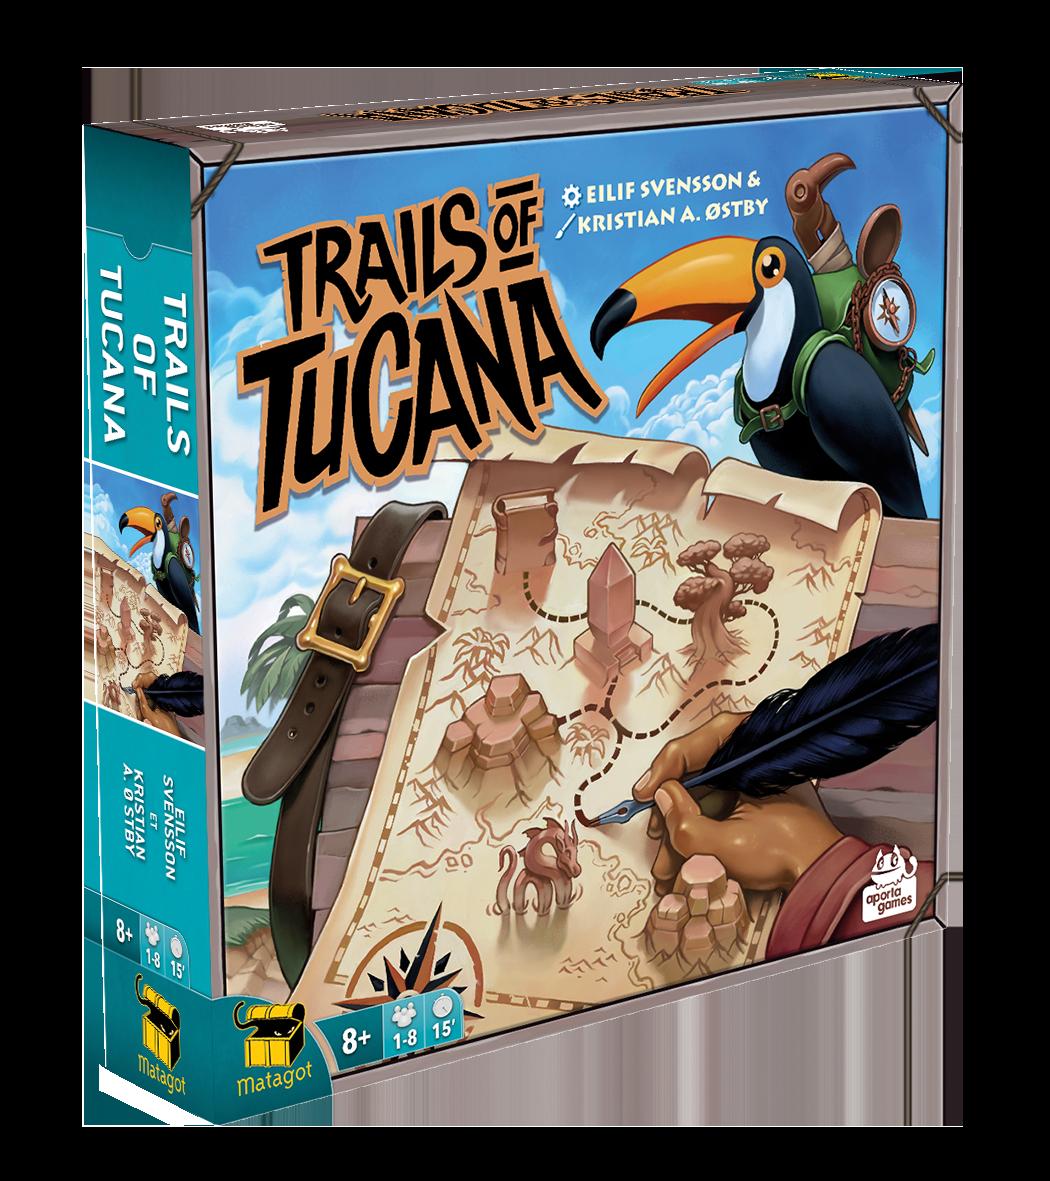 Trails Of Tucana jeu